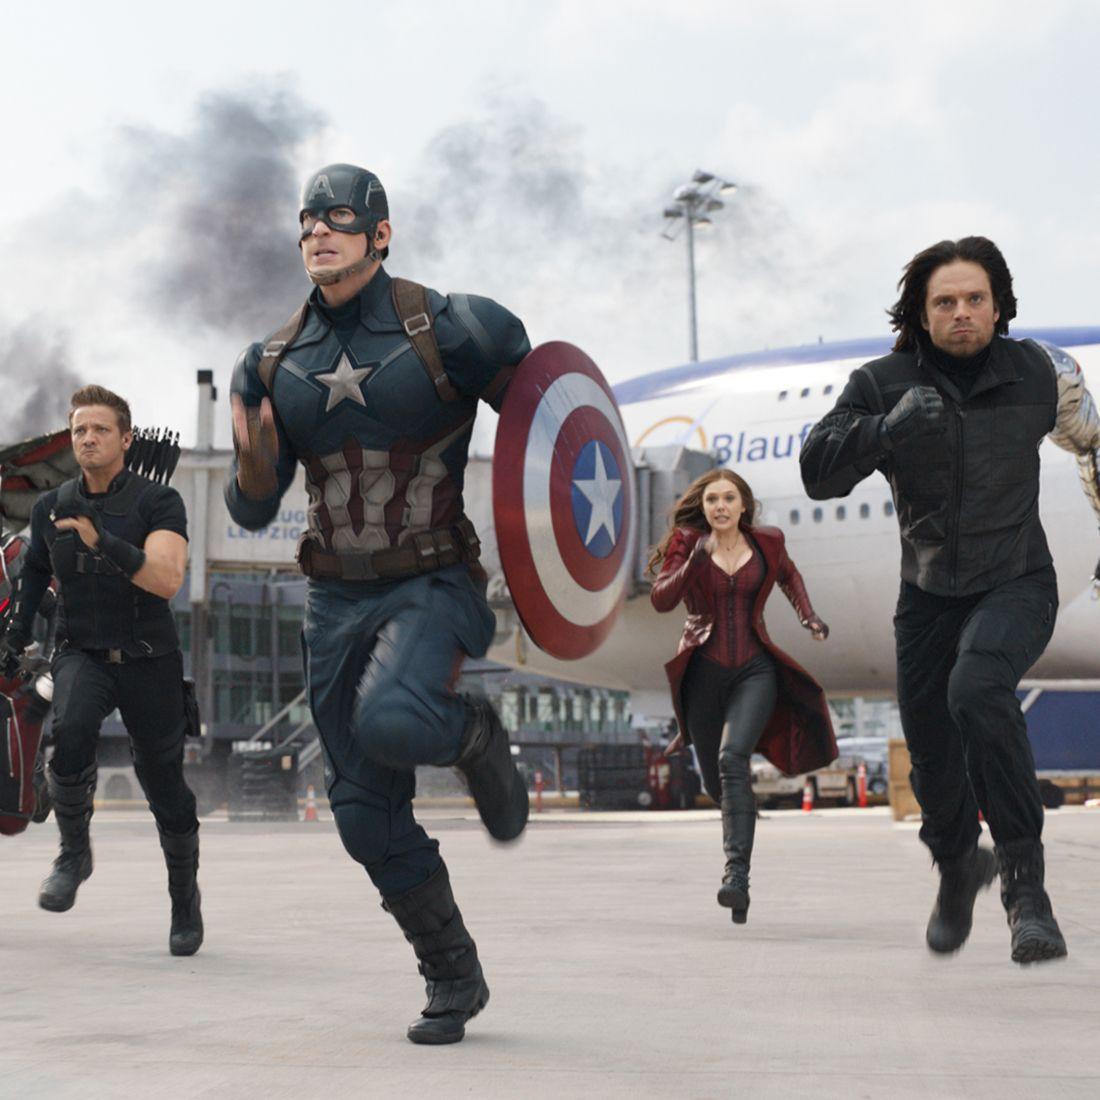 The First Avenger Civil War   Showdown unter Freunden   DER SPIEGEL